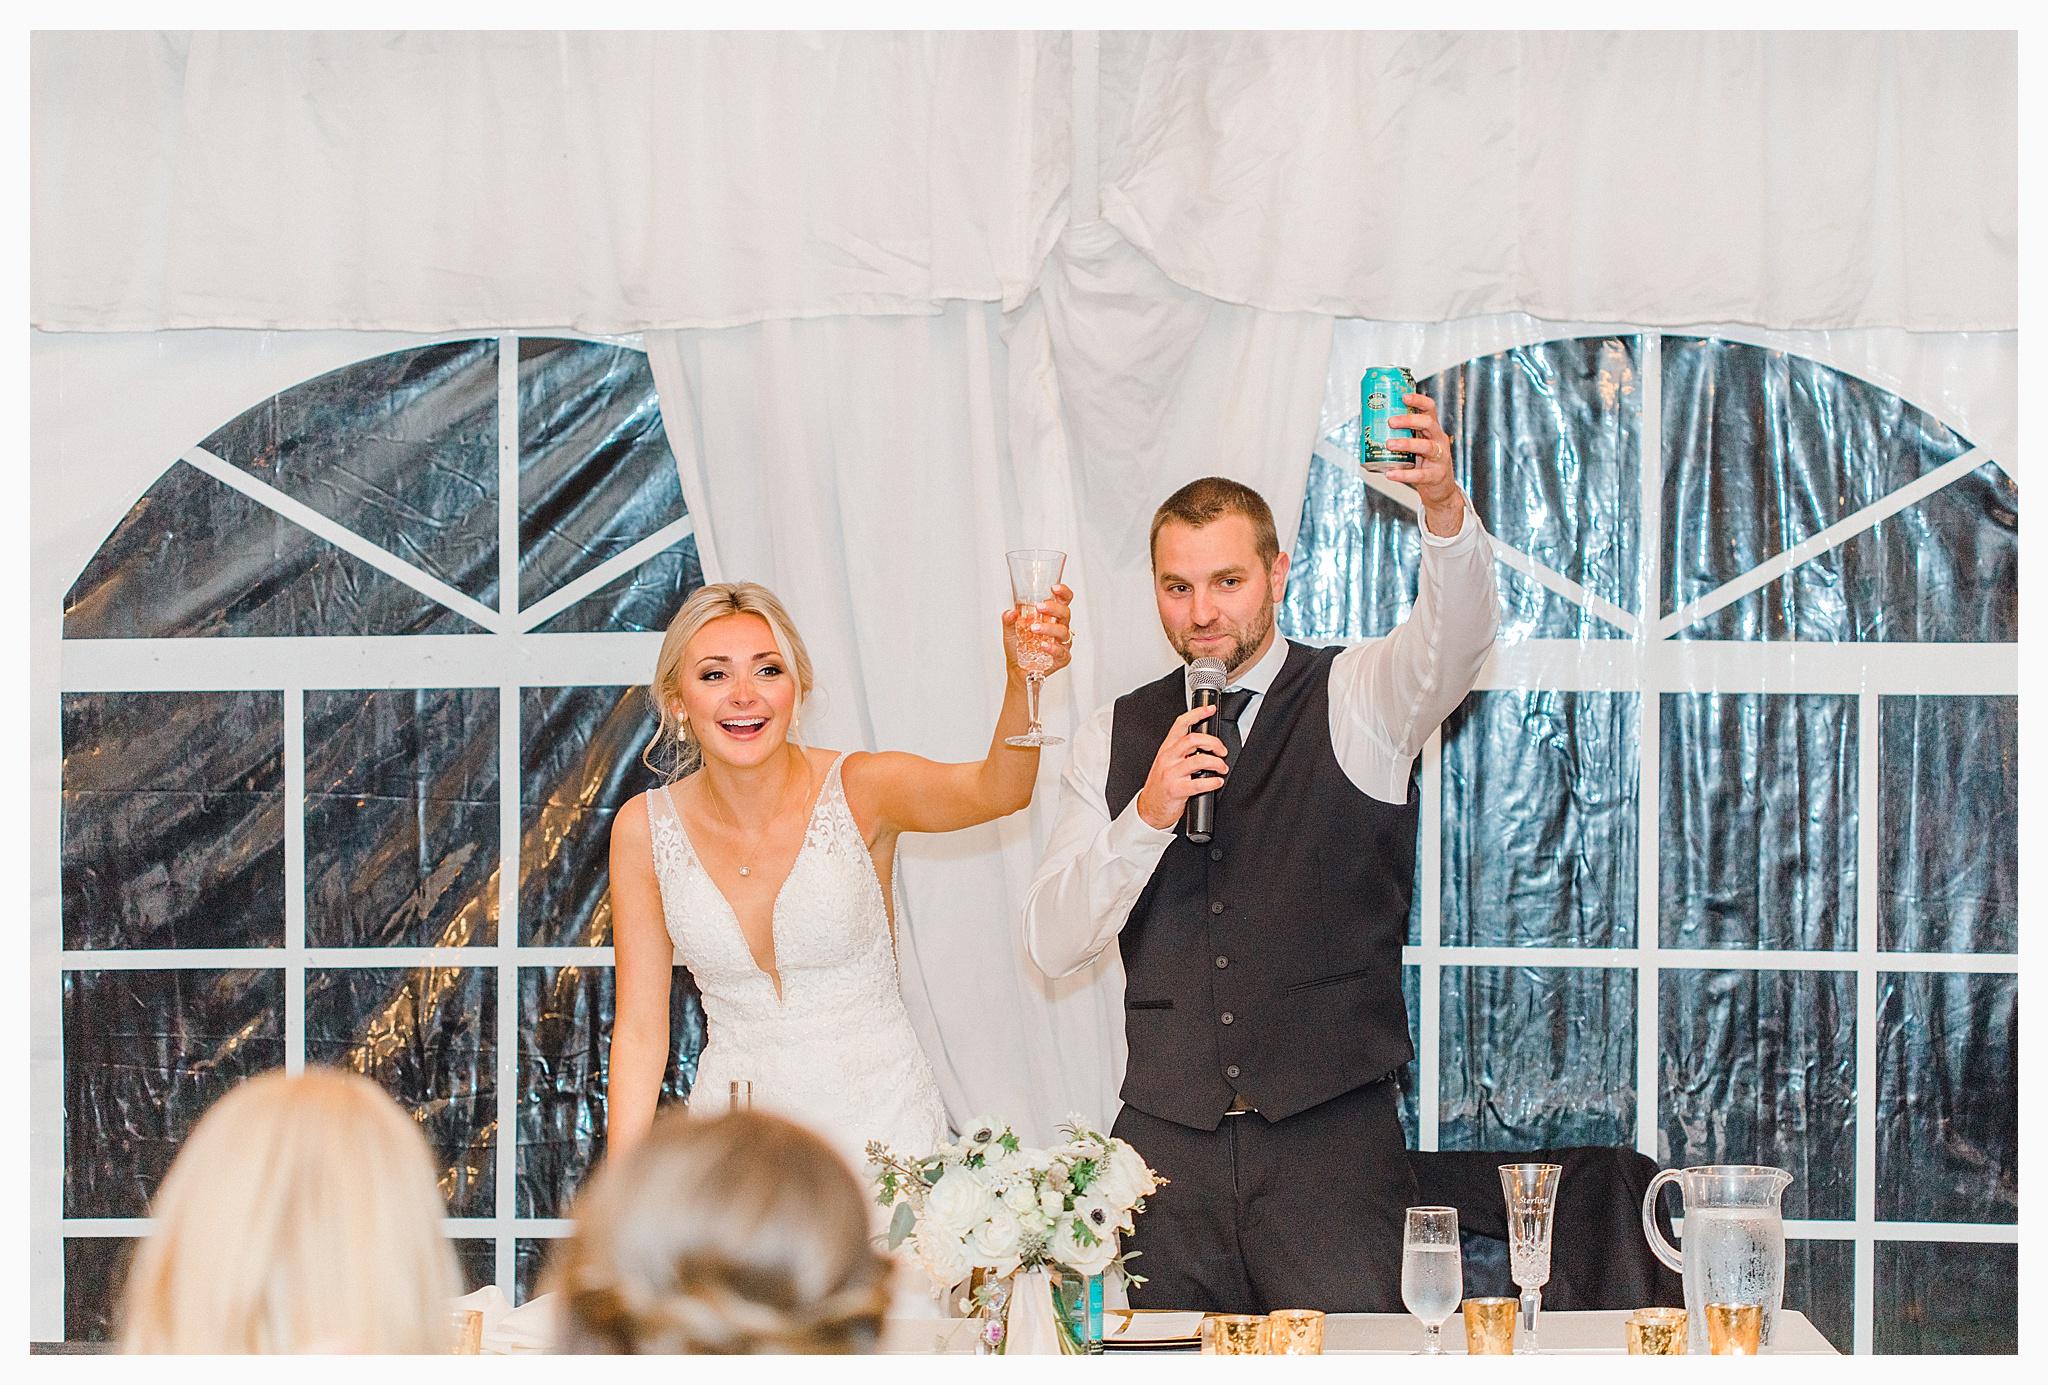 Emma Rose Company Light and Airy Wedding Photographer, Beautiful fall wedding at Rock Creek Gardens Venue in Puyallup, Washington._0102.jpg